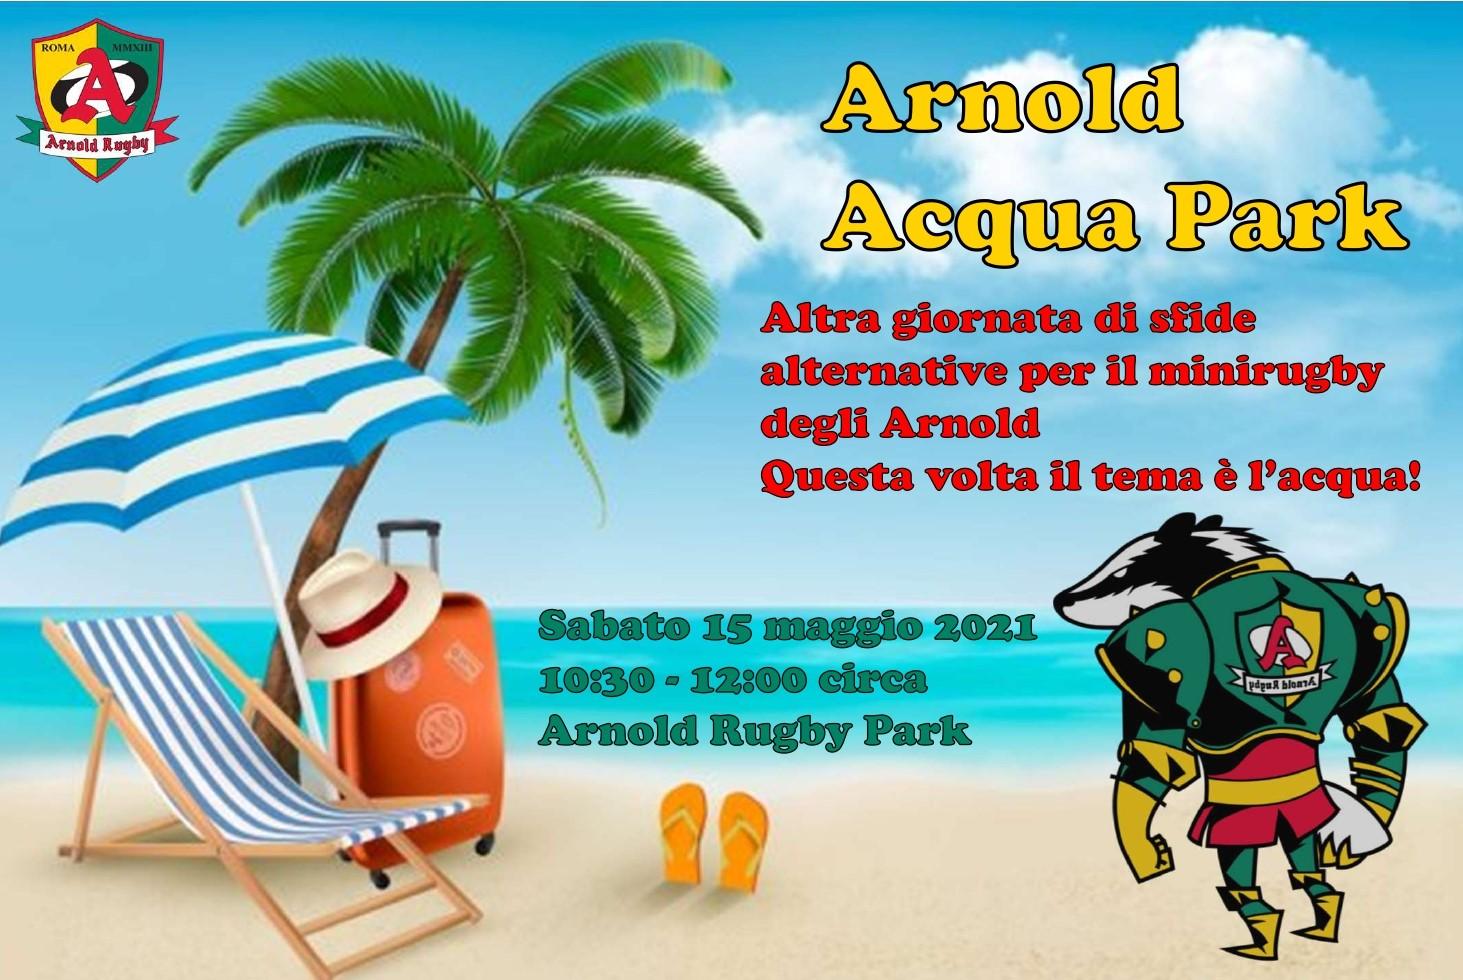 Arnold Acqua Park